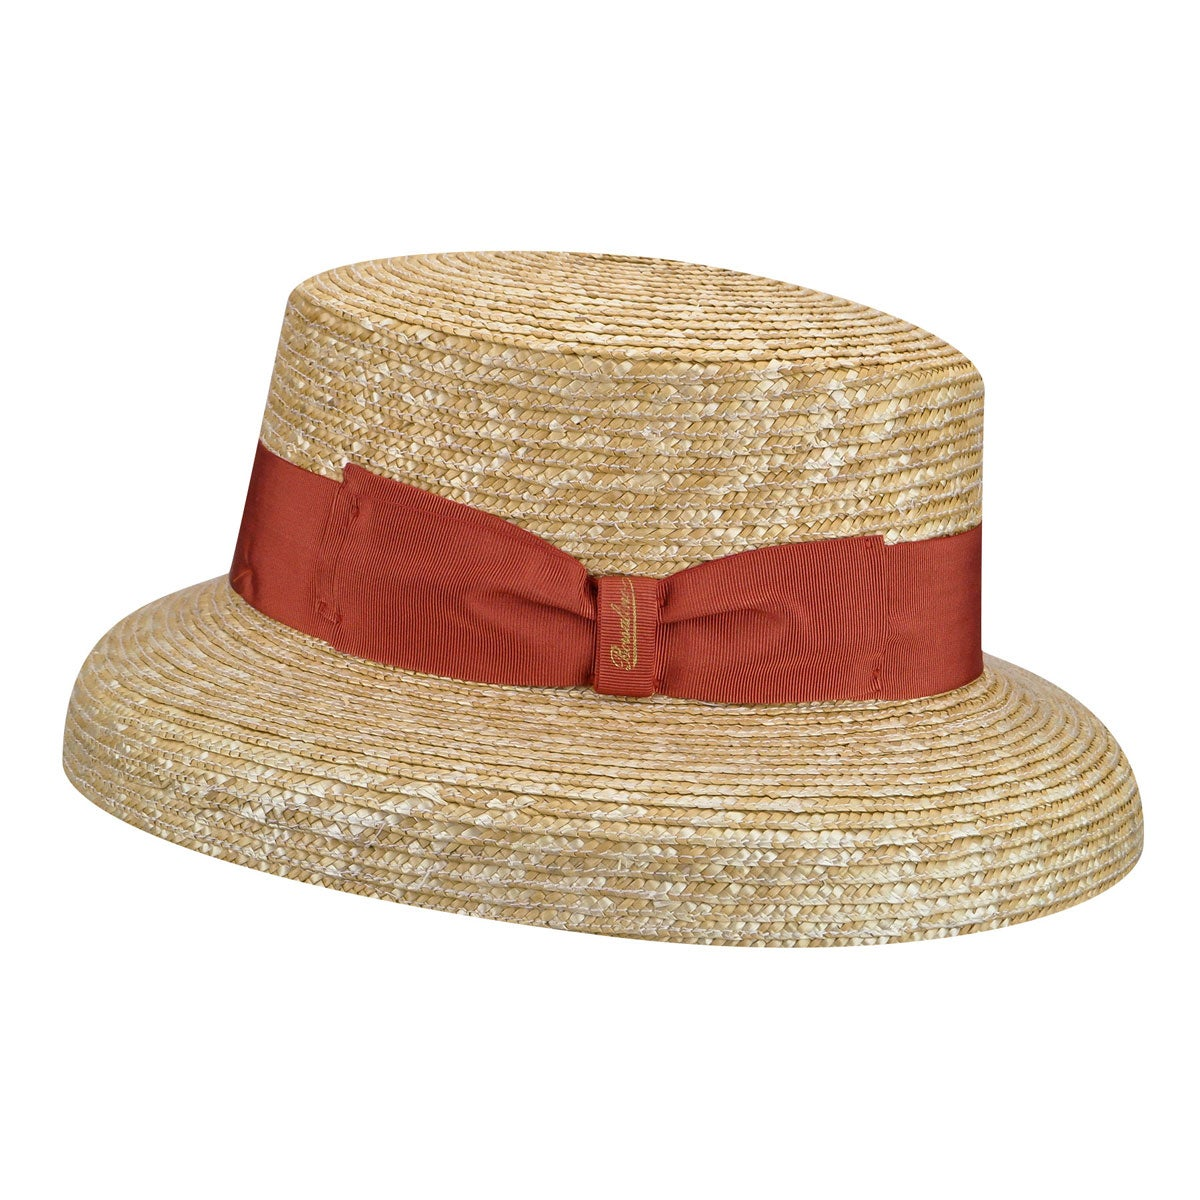 1940s Hats History 232105 Audrey Treccia Paglia Boater $263.00 AT vintagedancer.com